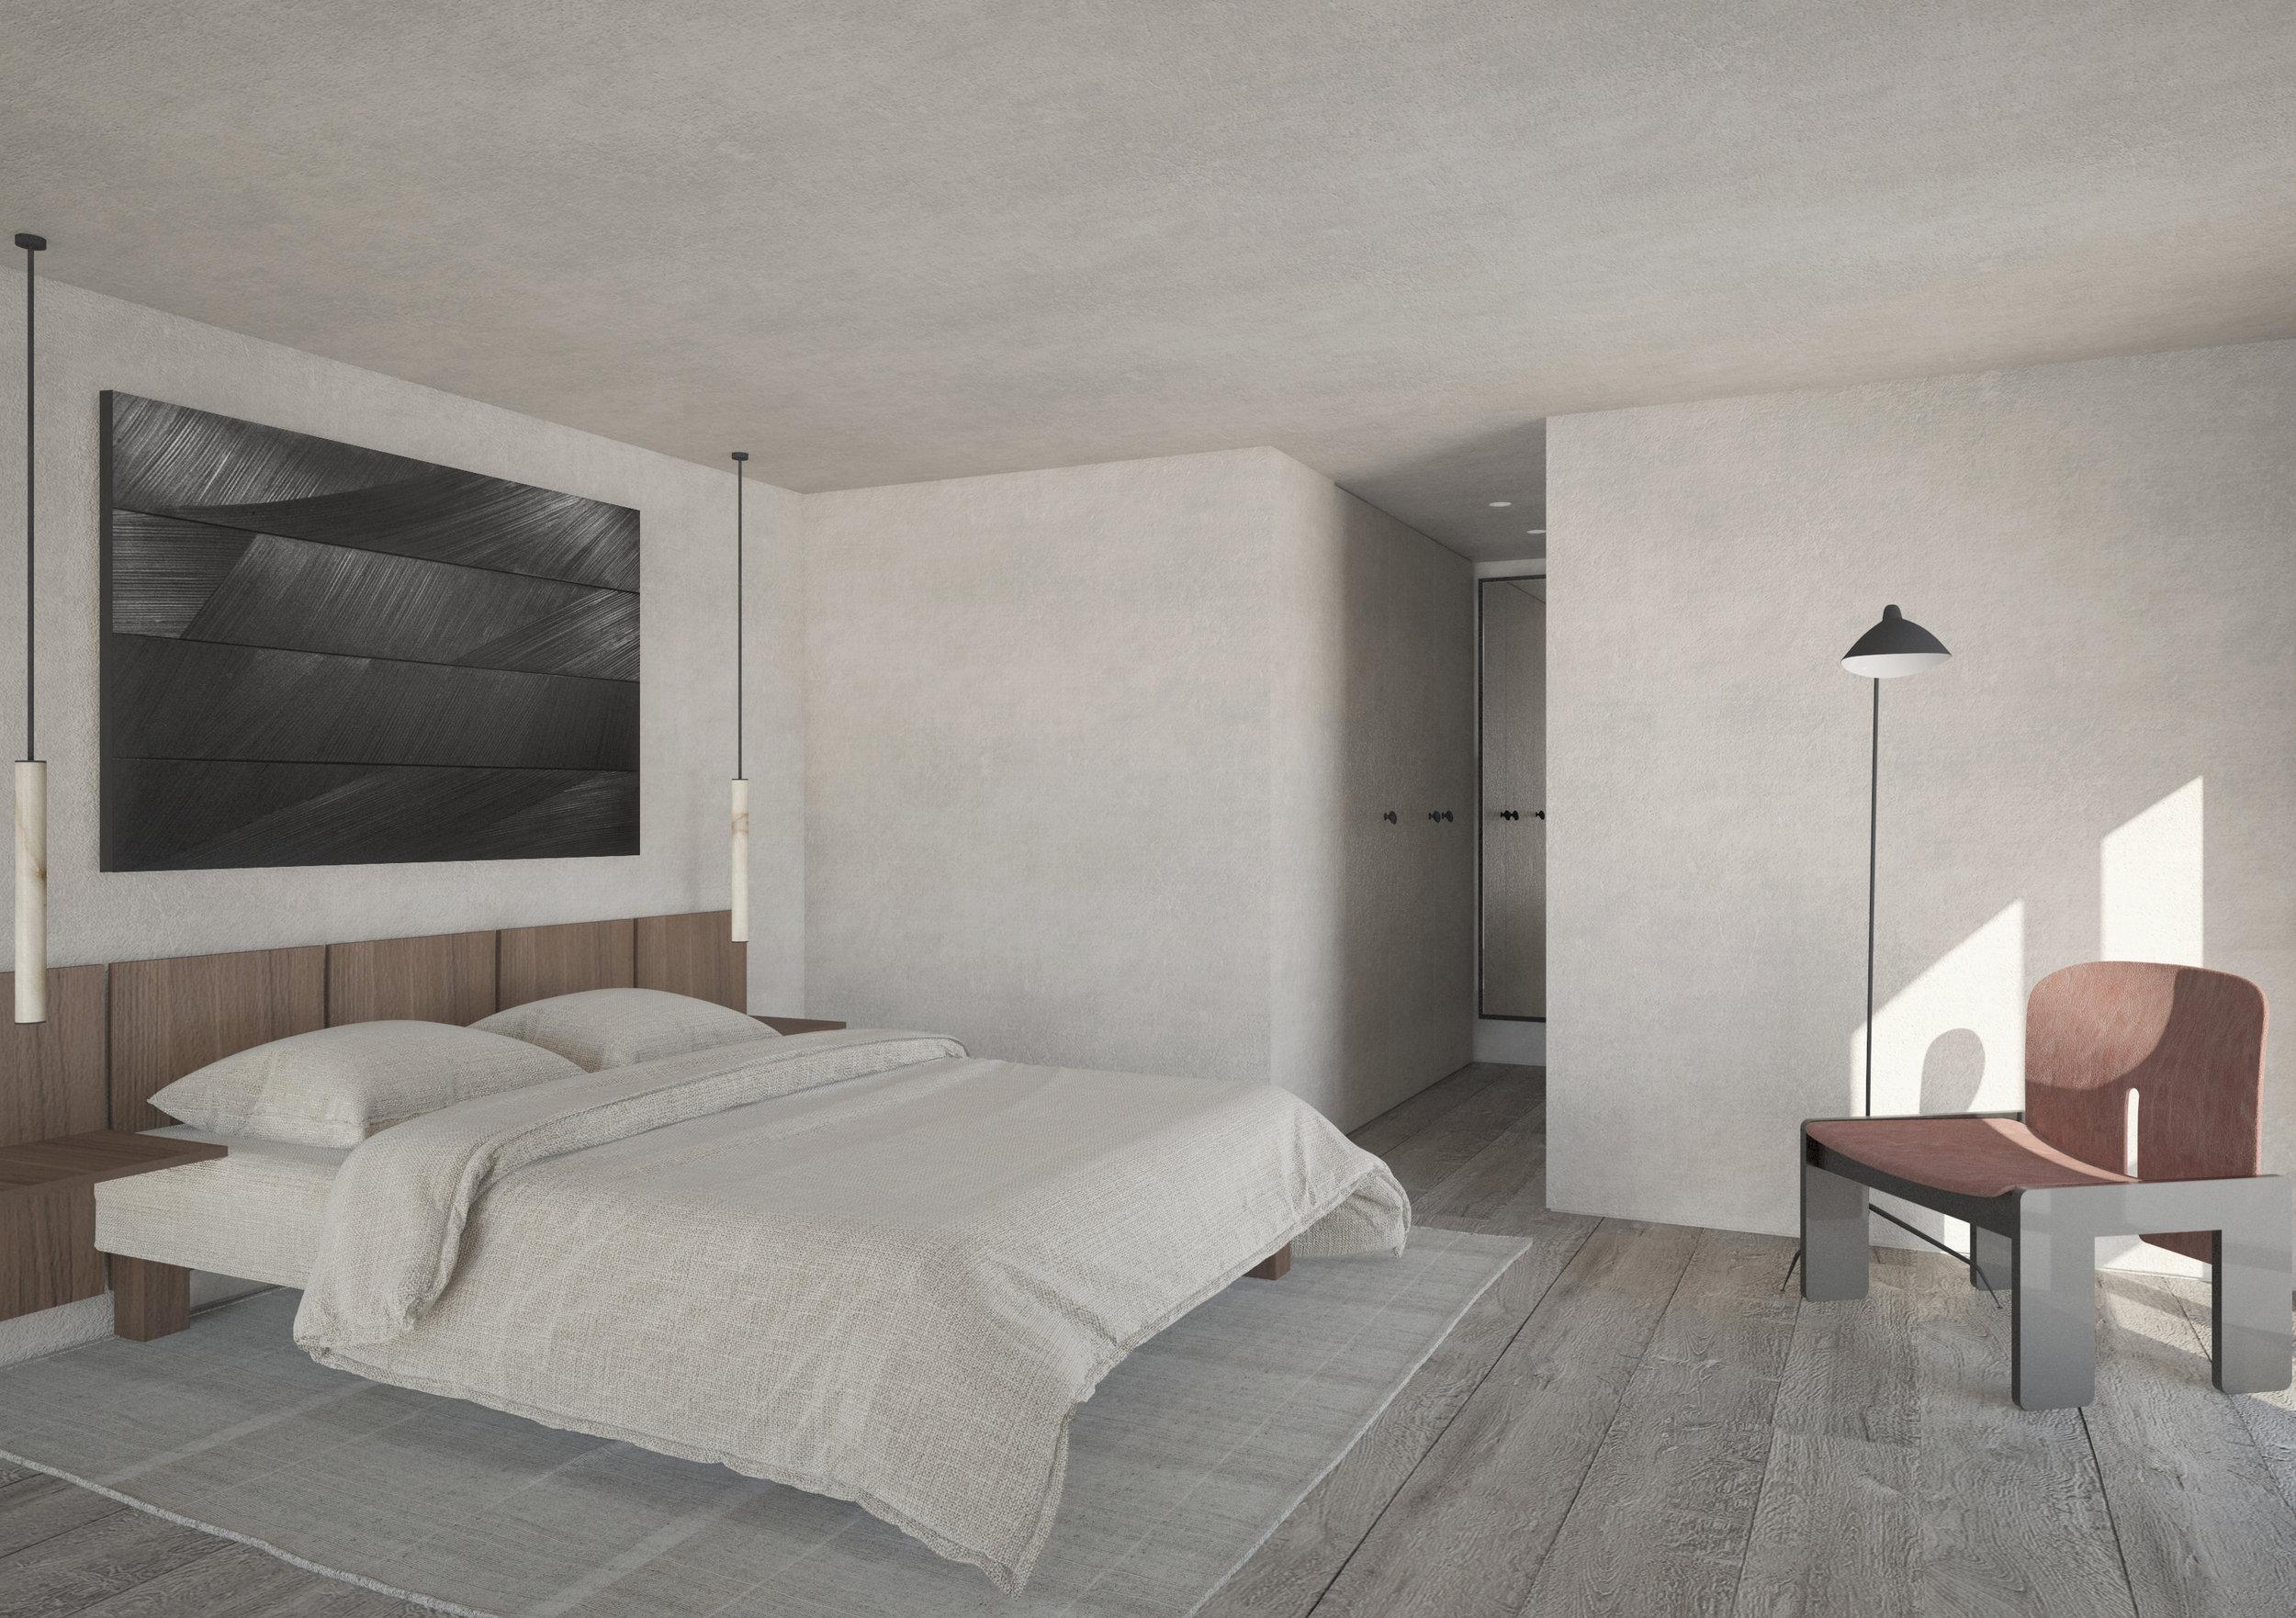 _IA_Ivan_Oddos_Valeriane_lazard_Grand_Veneur_Bedroom_01.jpg